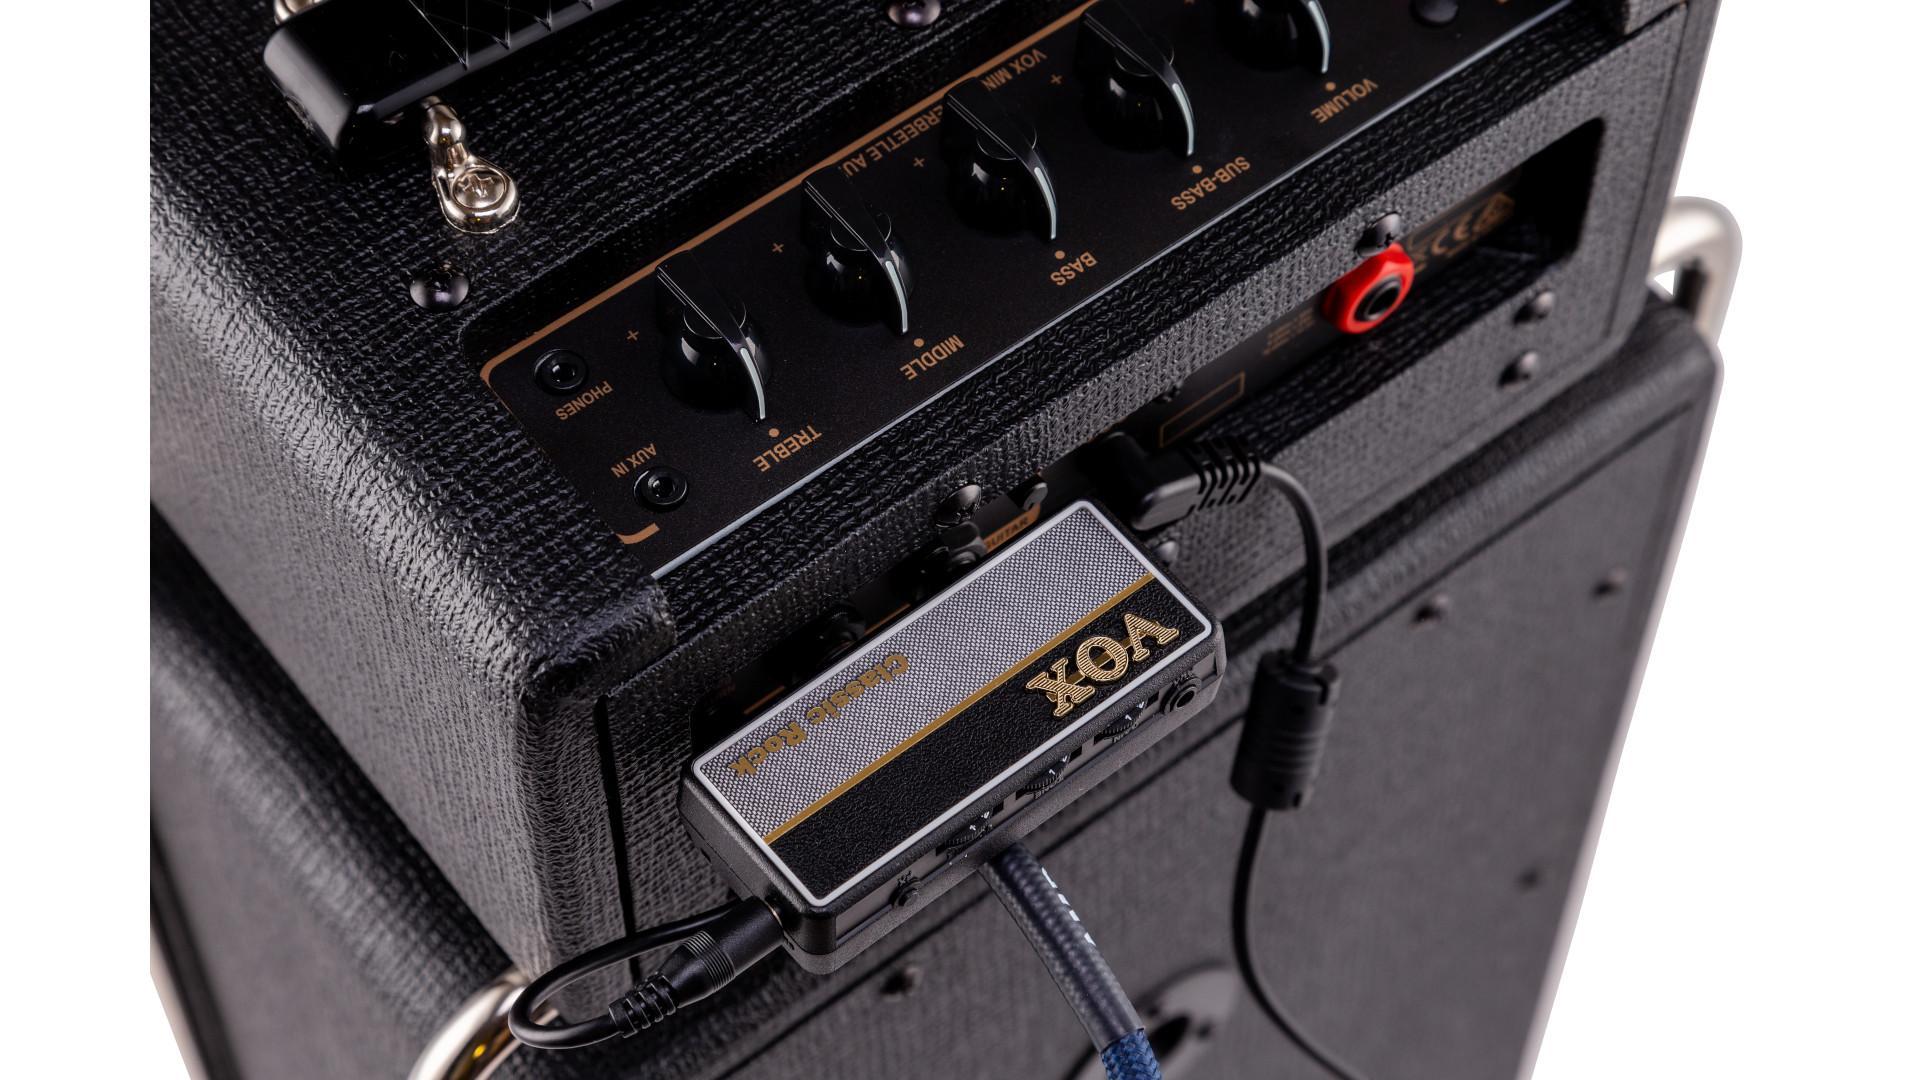 VOX Mini Super Beetle Audio